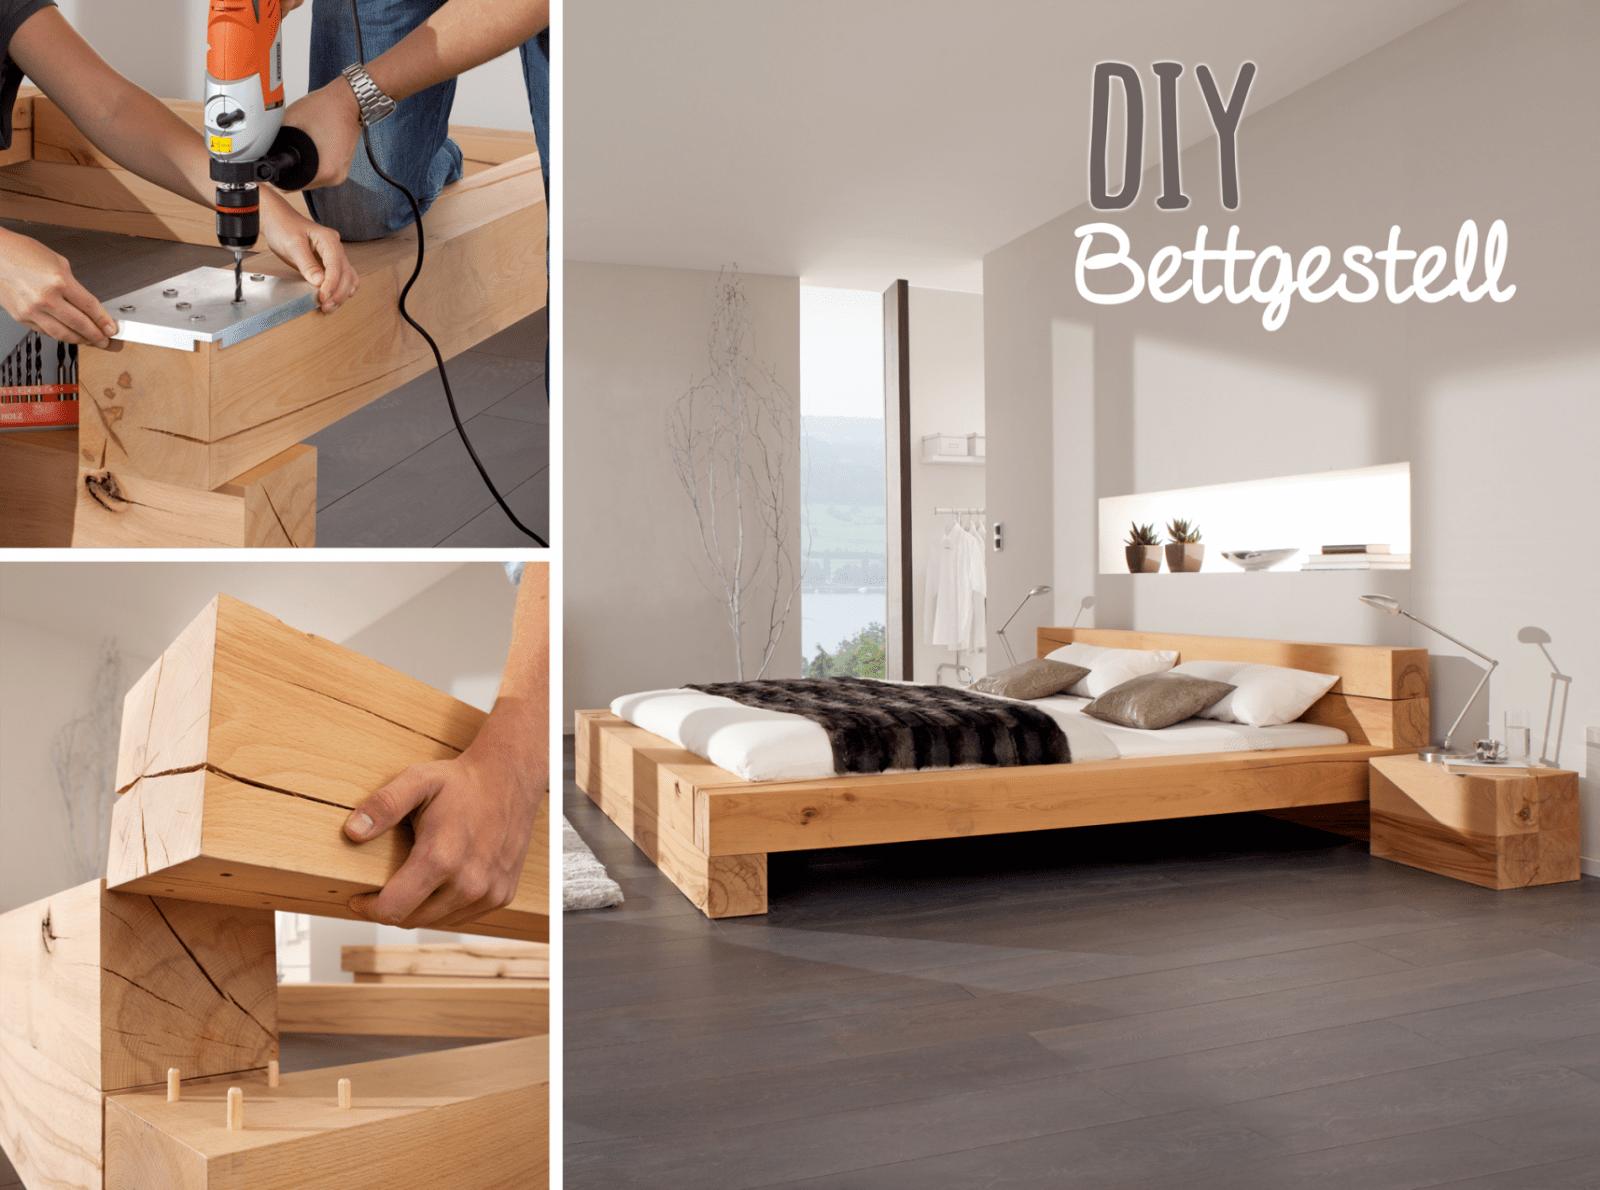 Massiv Blox Holzbalken  Bedden Balken En Slaapkamer von Bett Aus Balken Bauanleitung Bild